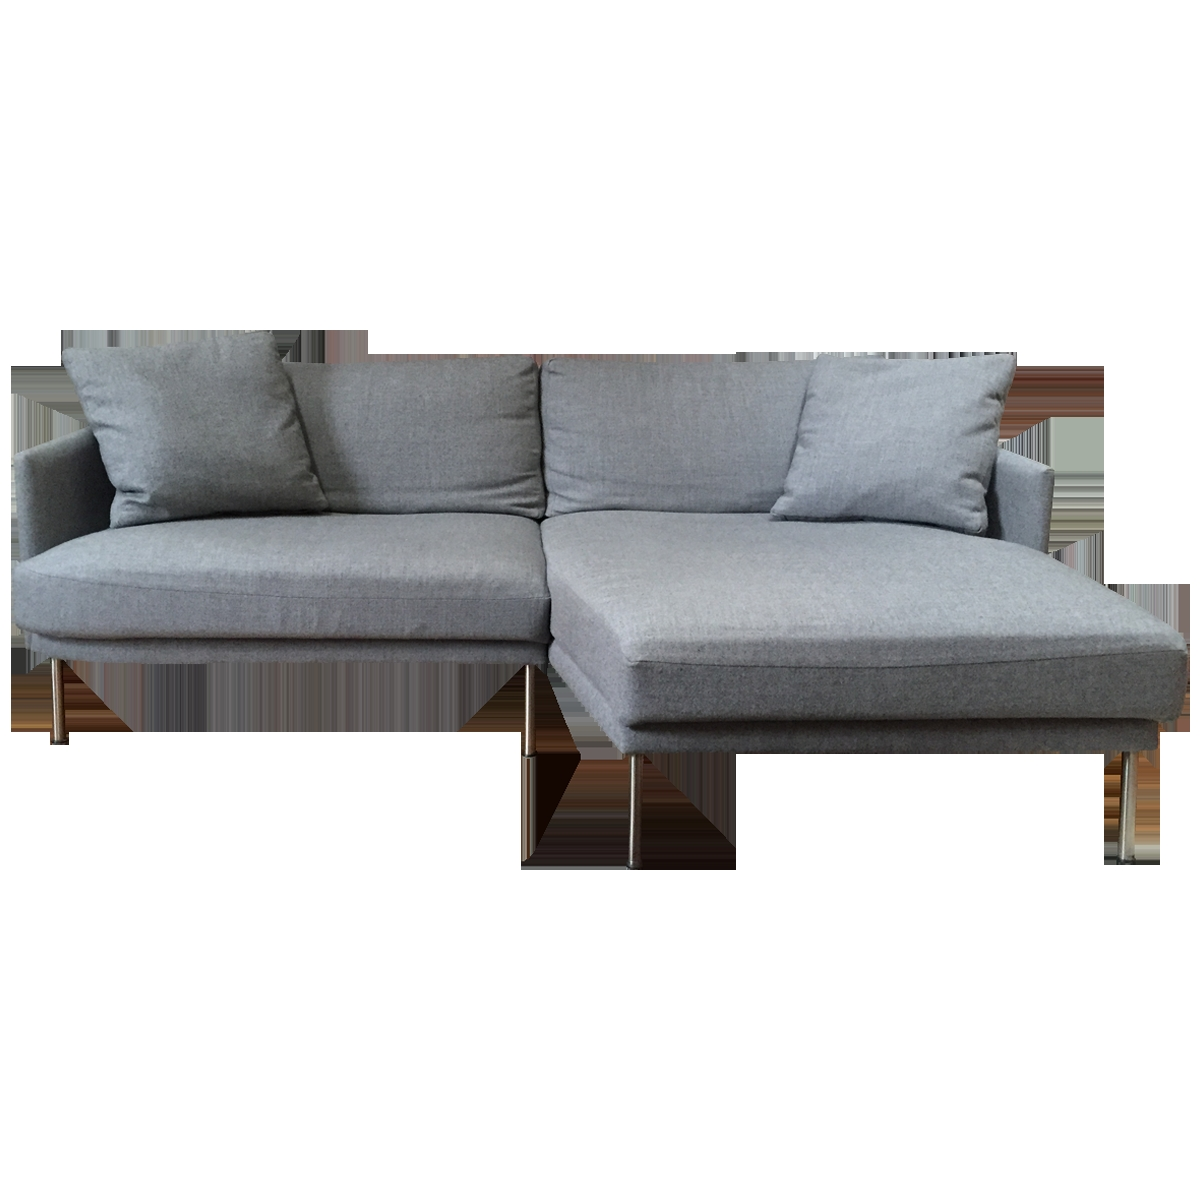 mini sectional leather sofa and loveseat costco compact sofas cream